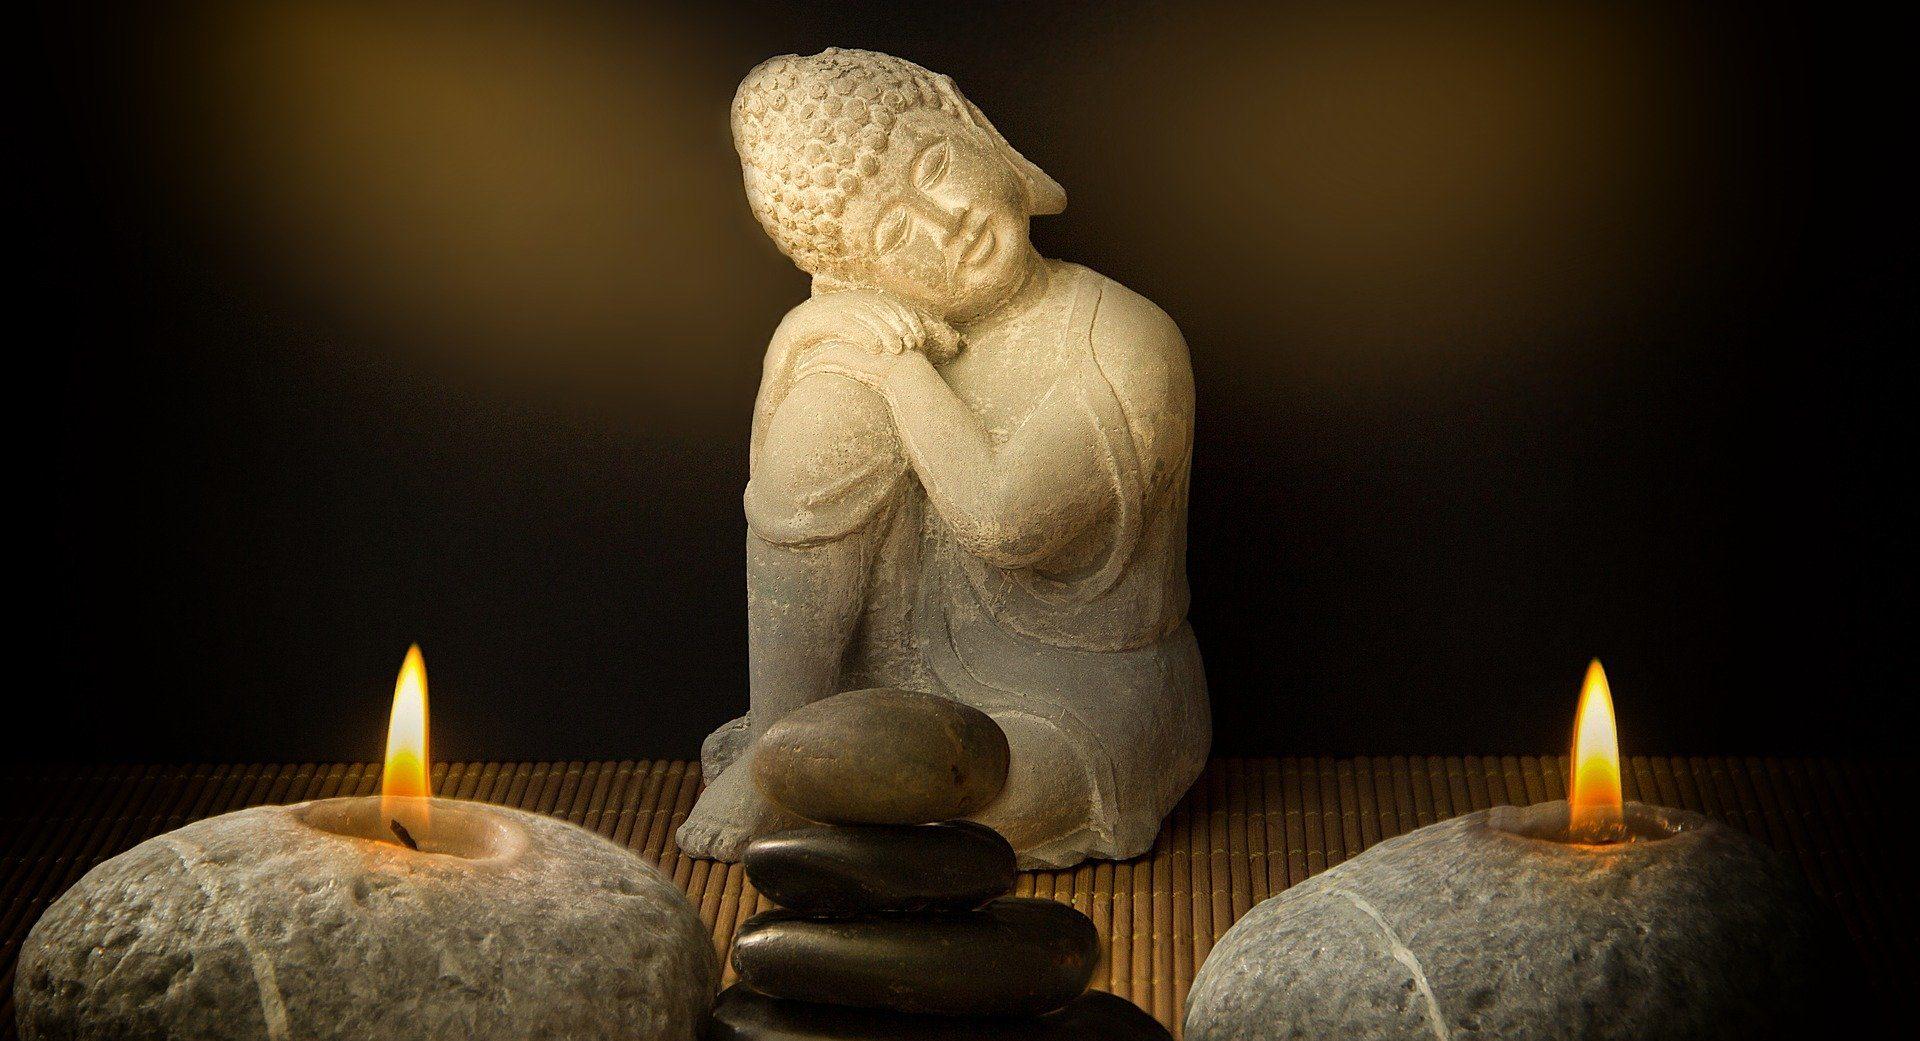 bougie et bouddha